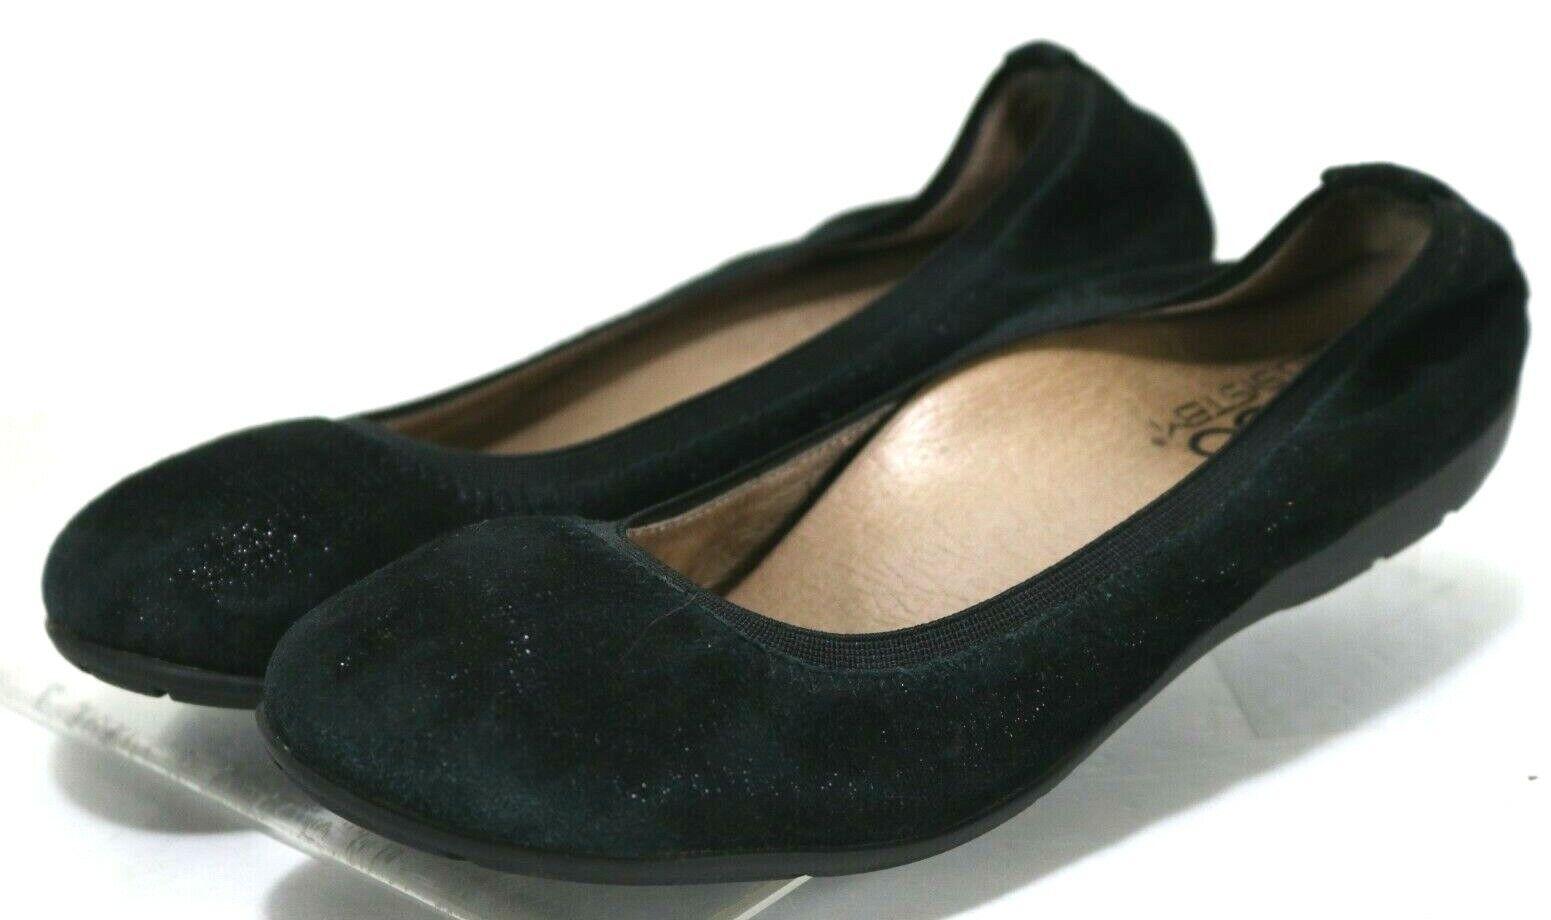 ABEO Tia Neutral  120 Women's Ballet Flats shoes Size 6.5 Suede Leather Black